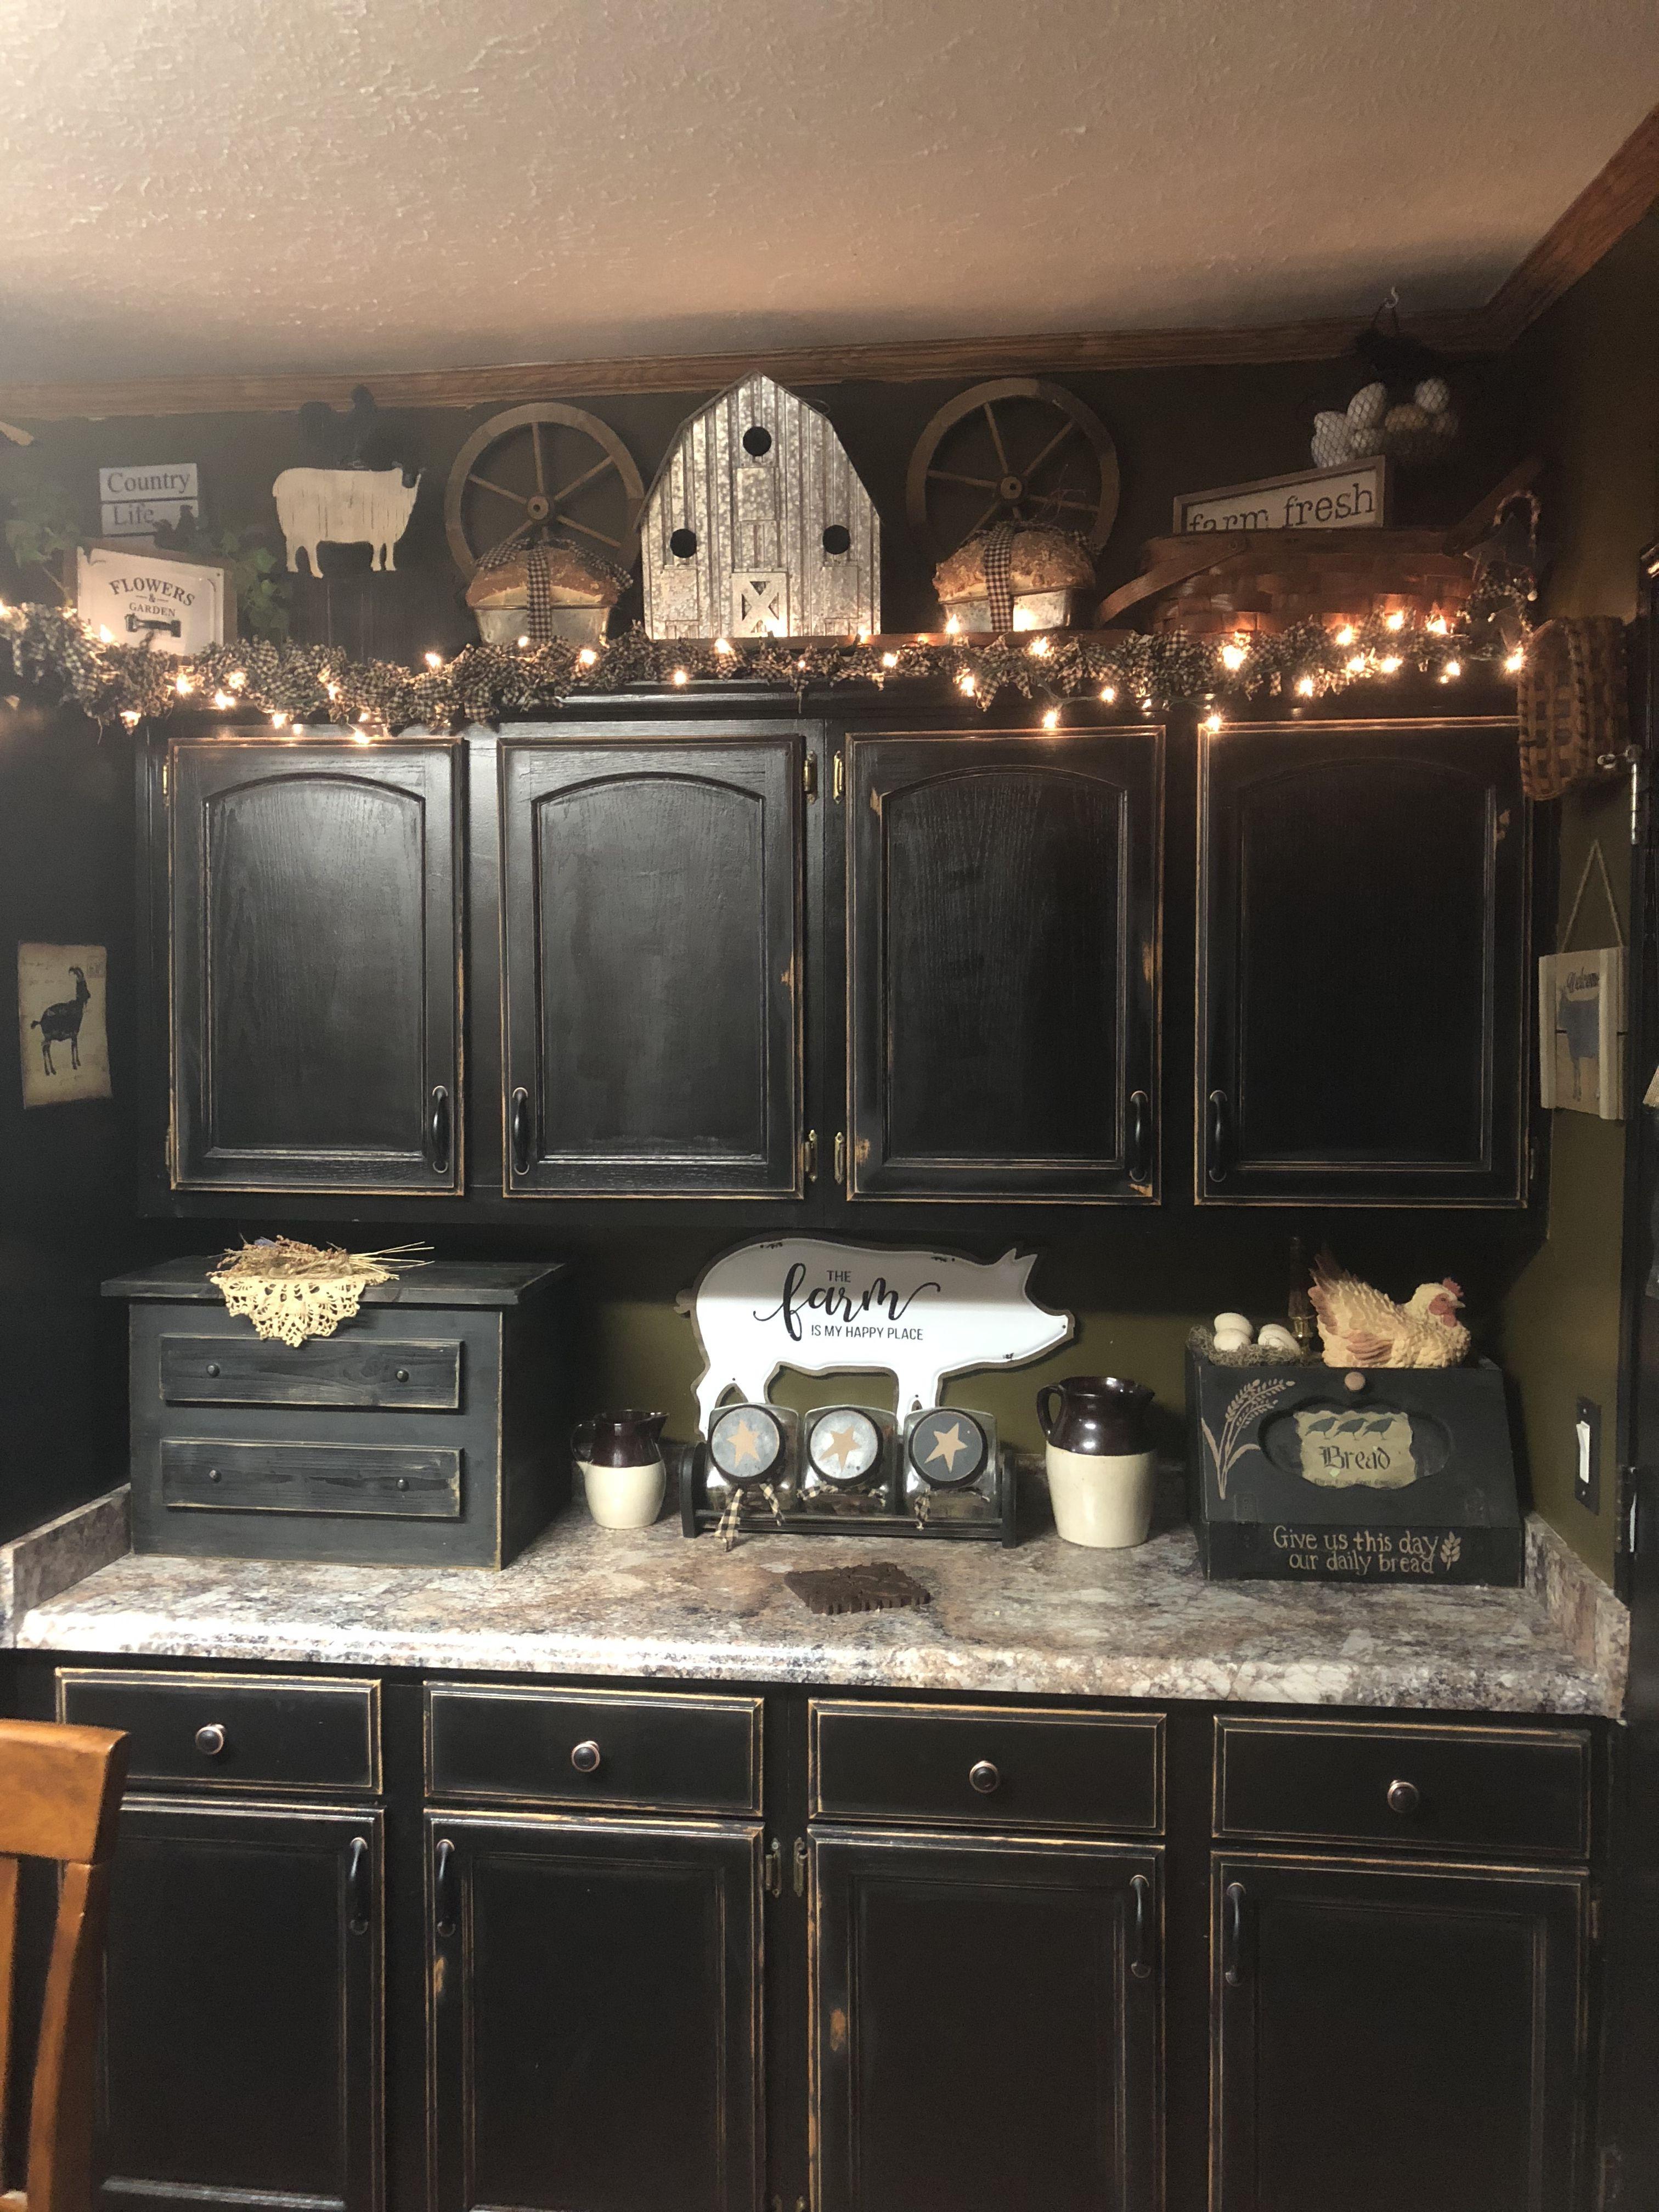 Farm House Primitive Kitchen Decor With Black Kitchen Cabinets